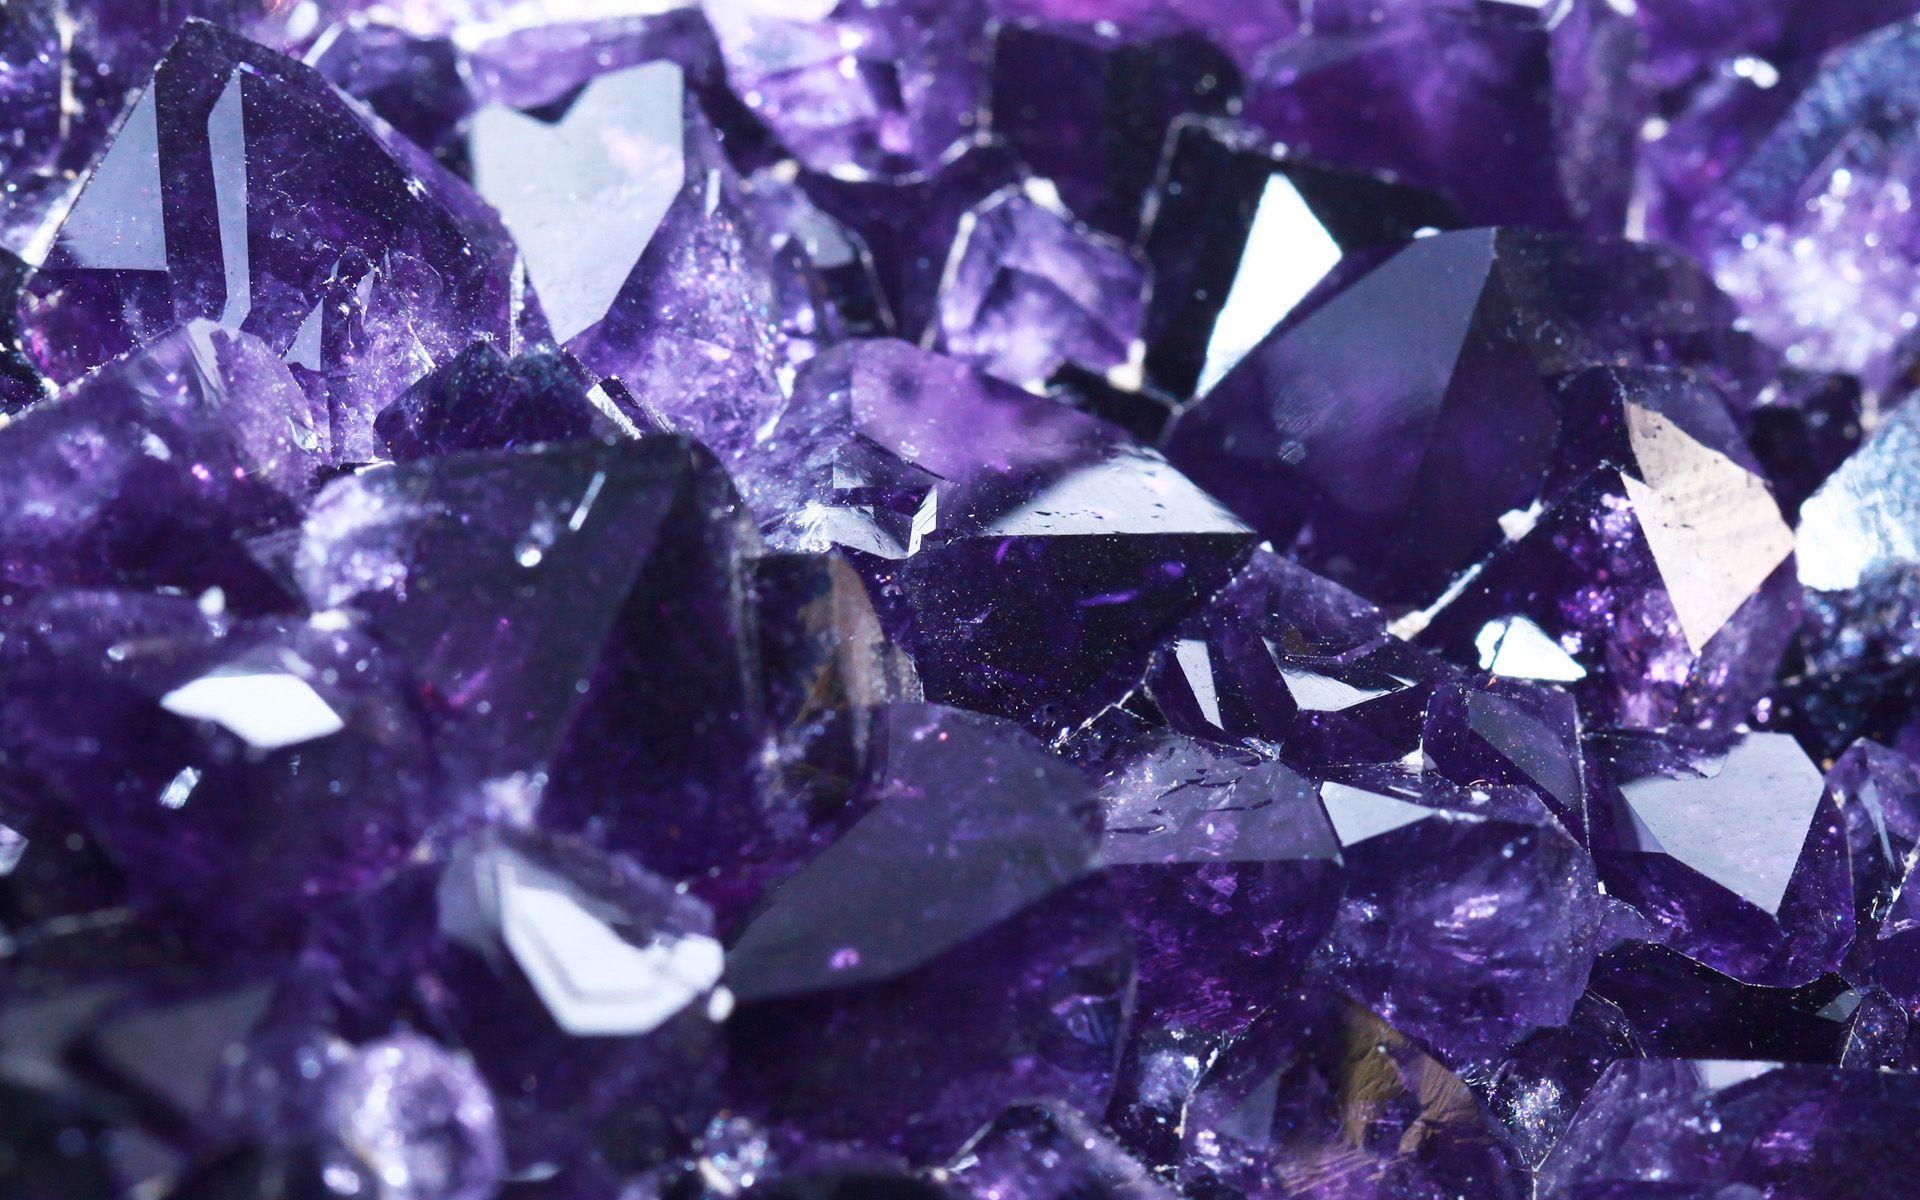 Crystal Purple Aesthetic Wallpapers - Top Free Crystal ...